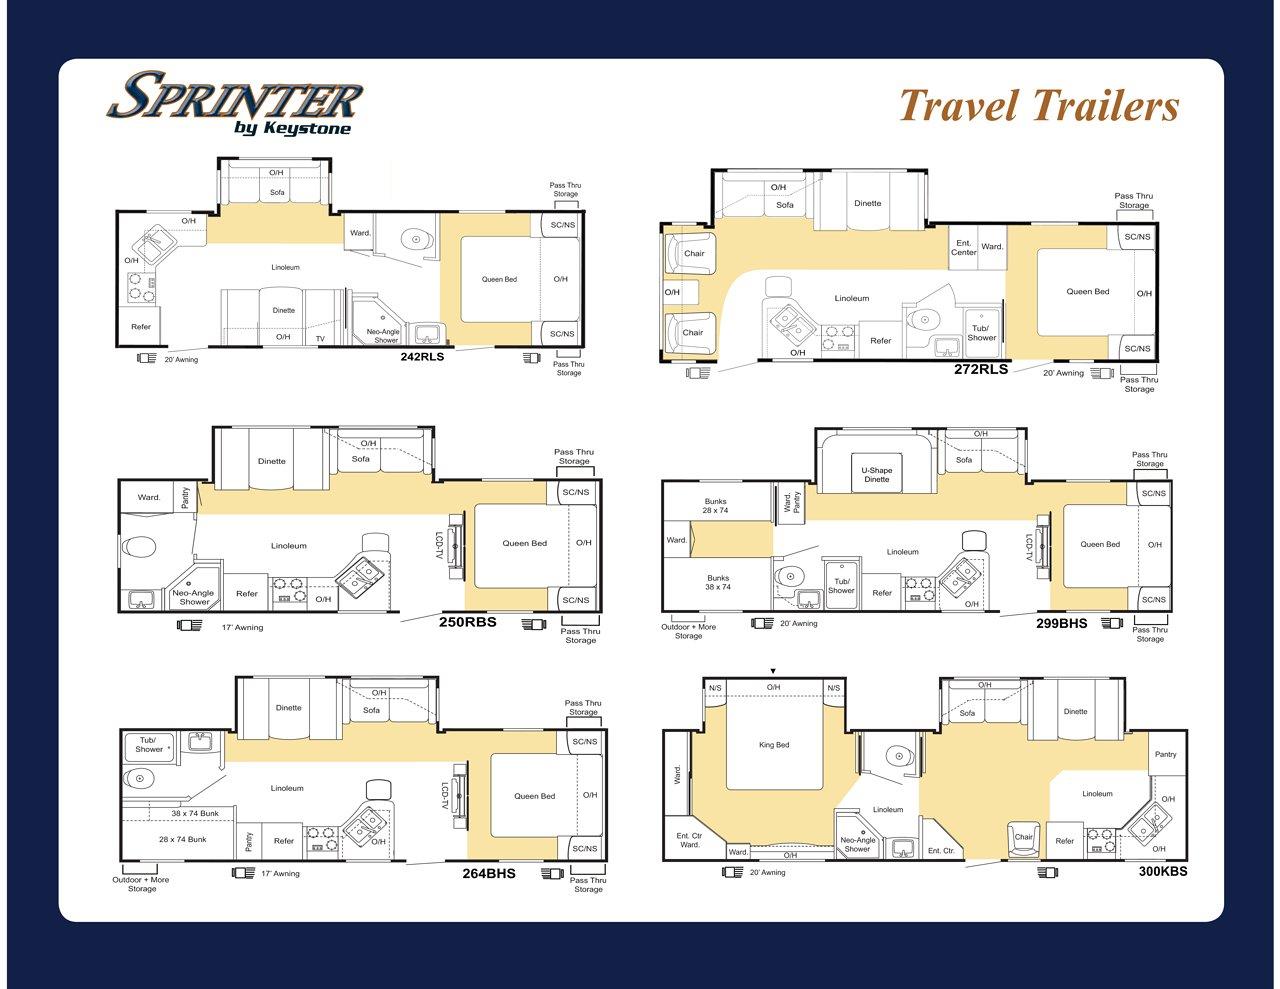 YA_2240] Keystone Sprinter Wiring Diagram Free DiagramIstic Tacle Sple Shopa Gray Semec Mohammedshrine Librar Wiring 101